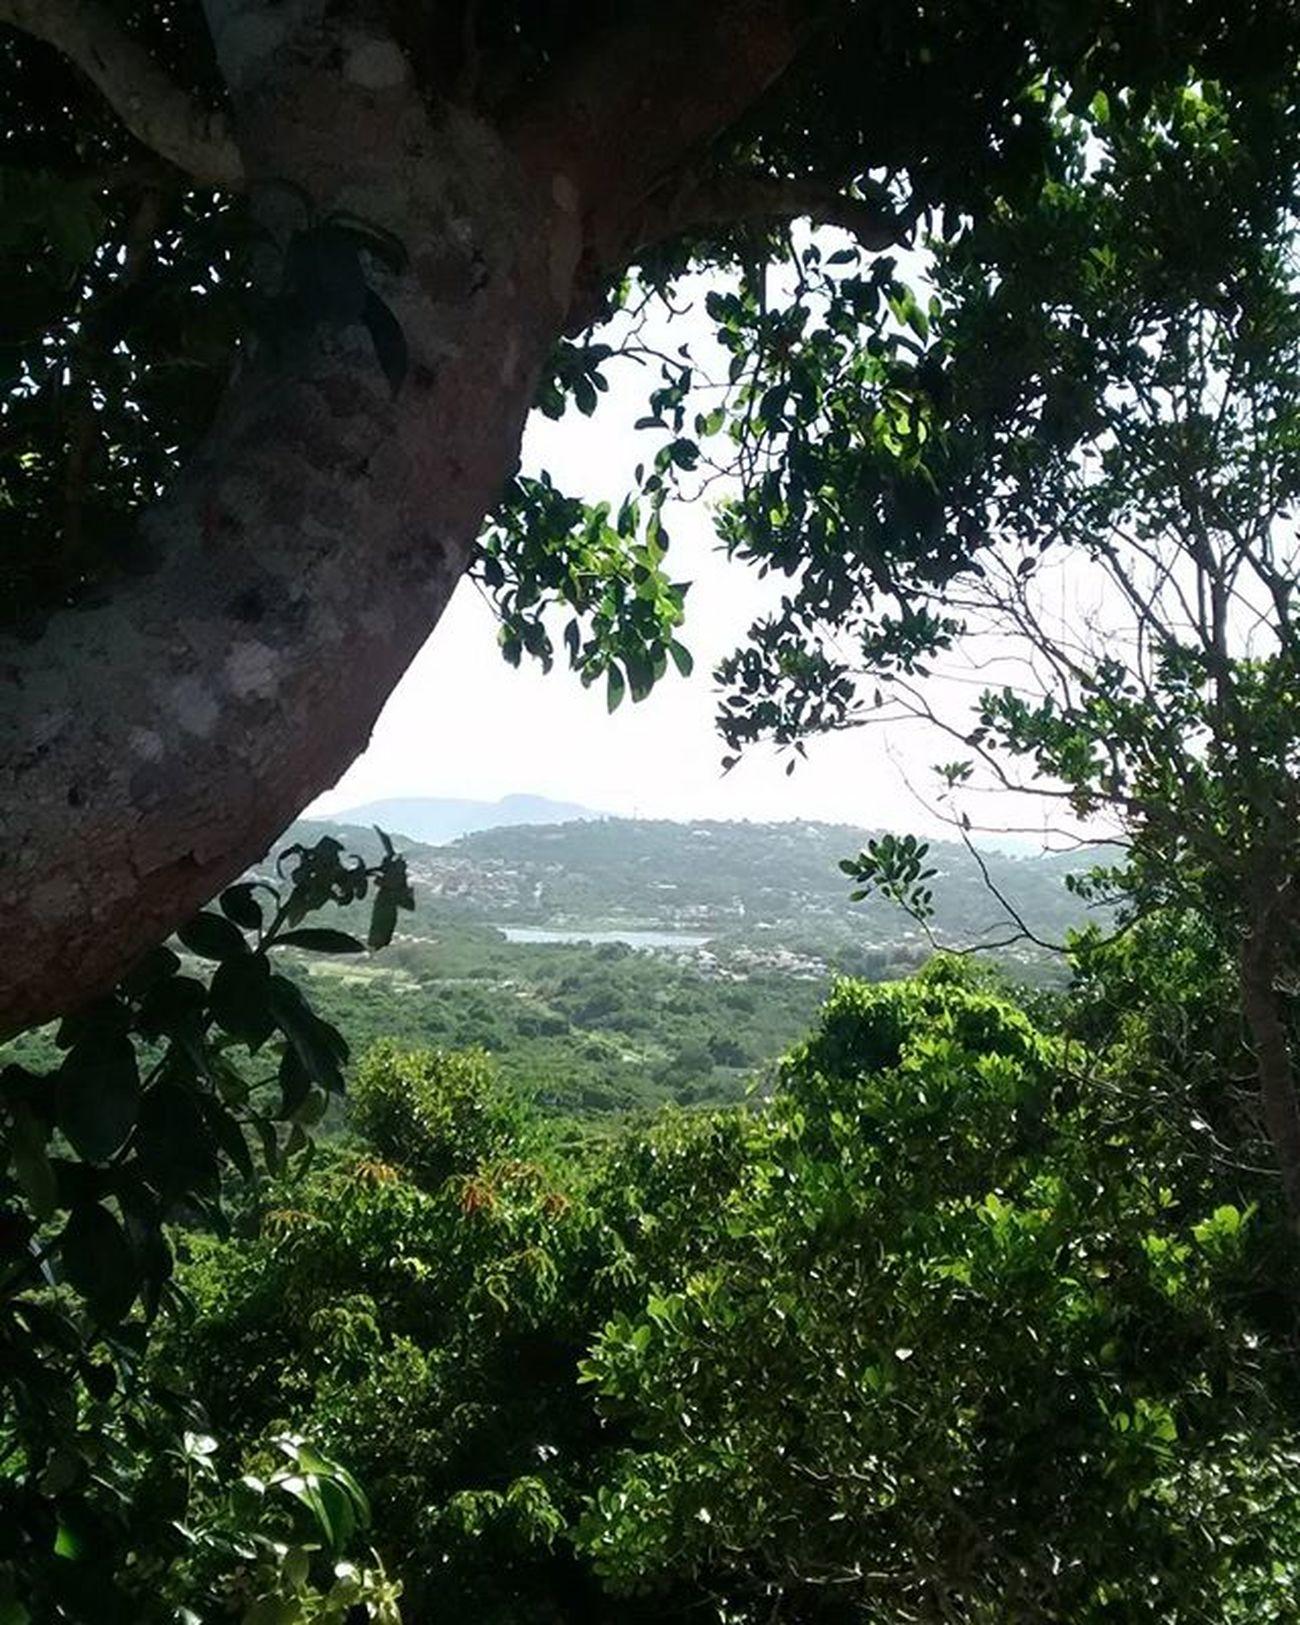 Viva o verde! Green Verde Nature Natureza Naturaleza Naturale Arvore Arboles Alberi Tree Buzios Buziosrj Riodejaneiro Rj40graus Brasil Brazil Semfiltro